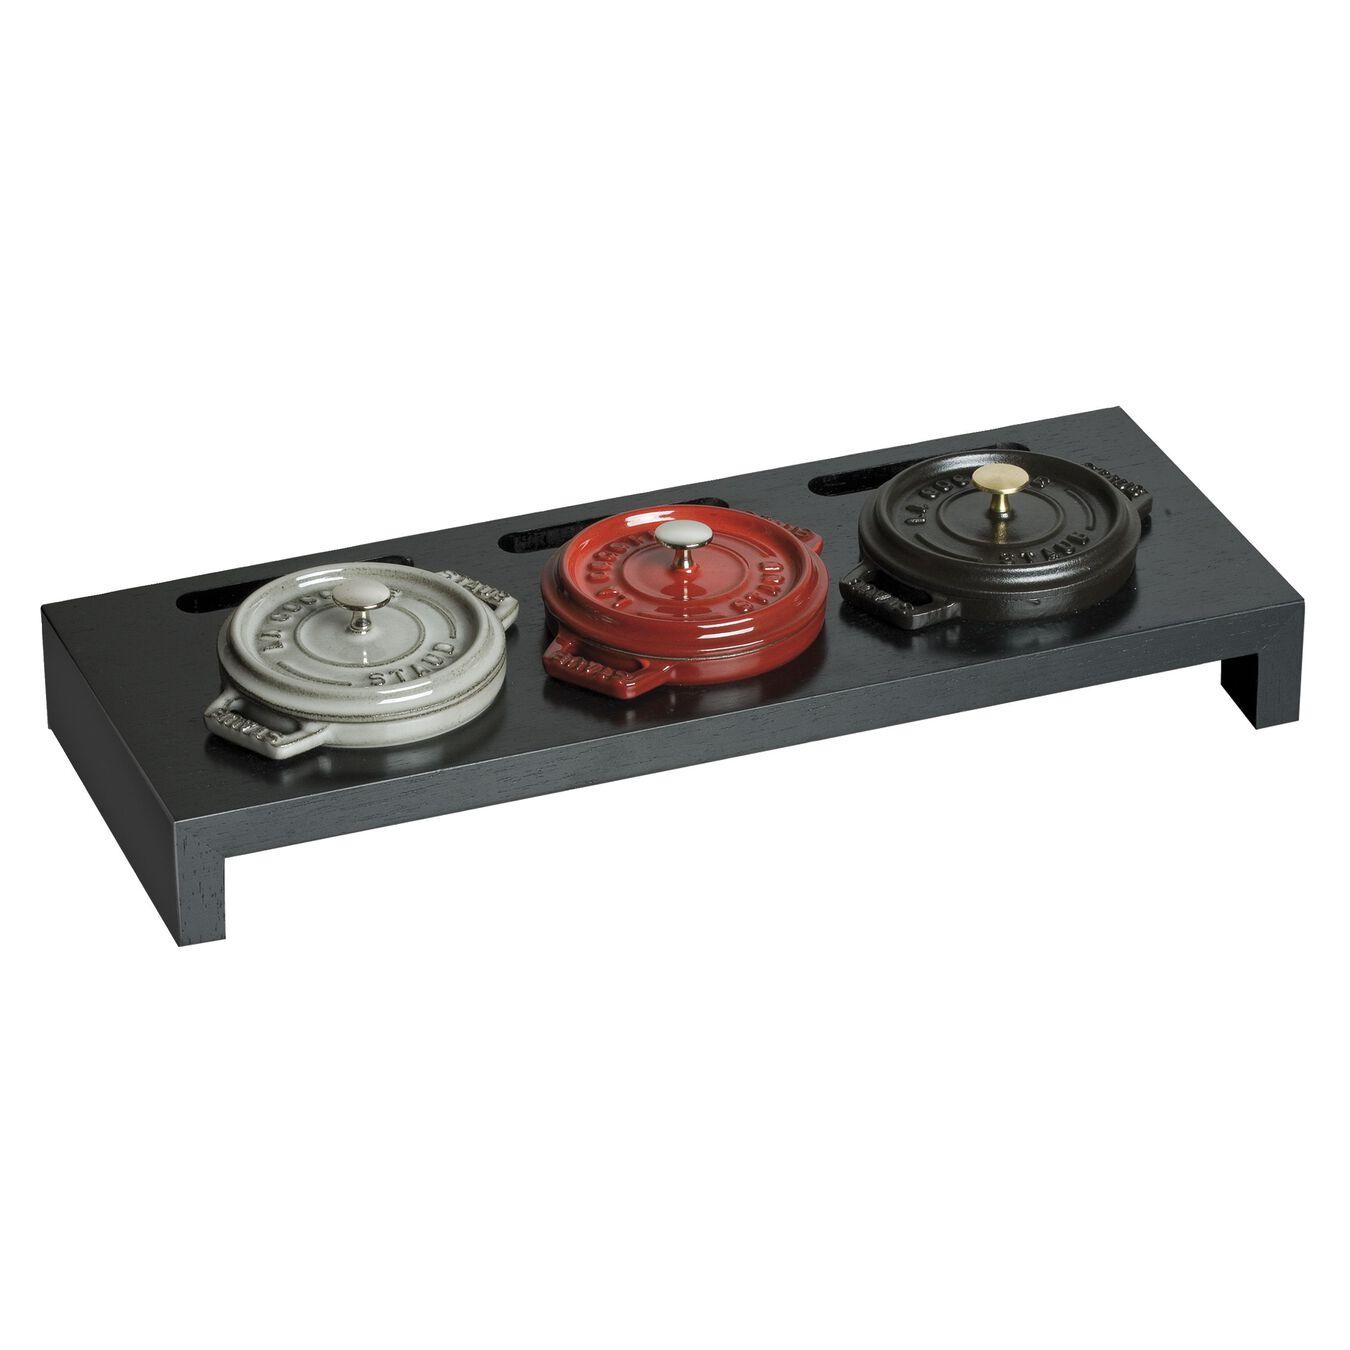 Fiber wood, Mini Cocotte Stand, black matte,,large 3